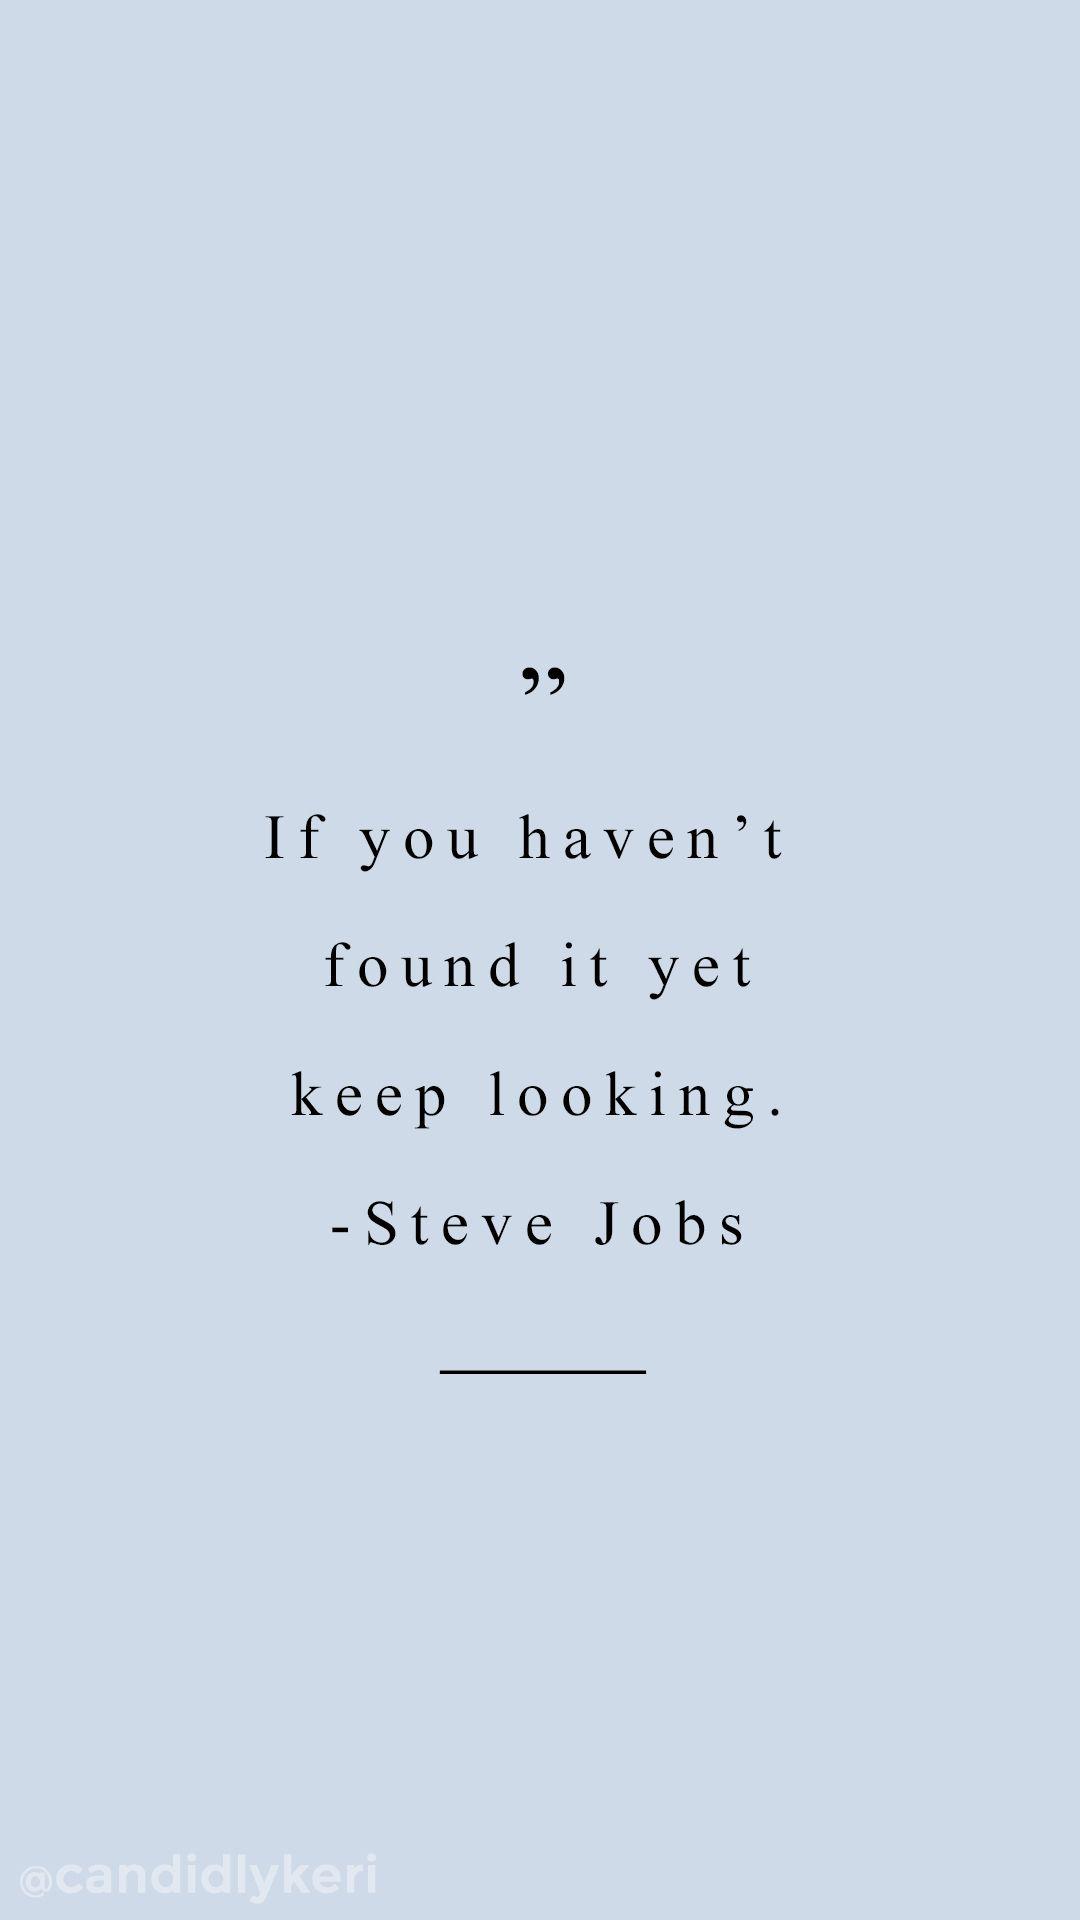 Steve Jobs Motivational Quotes Tumblr thumbnail